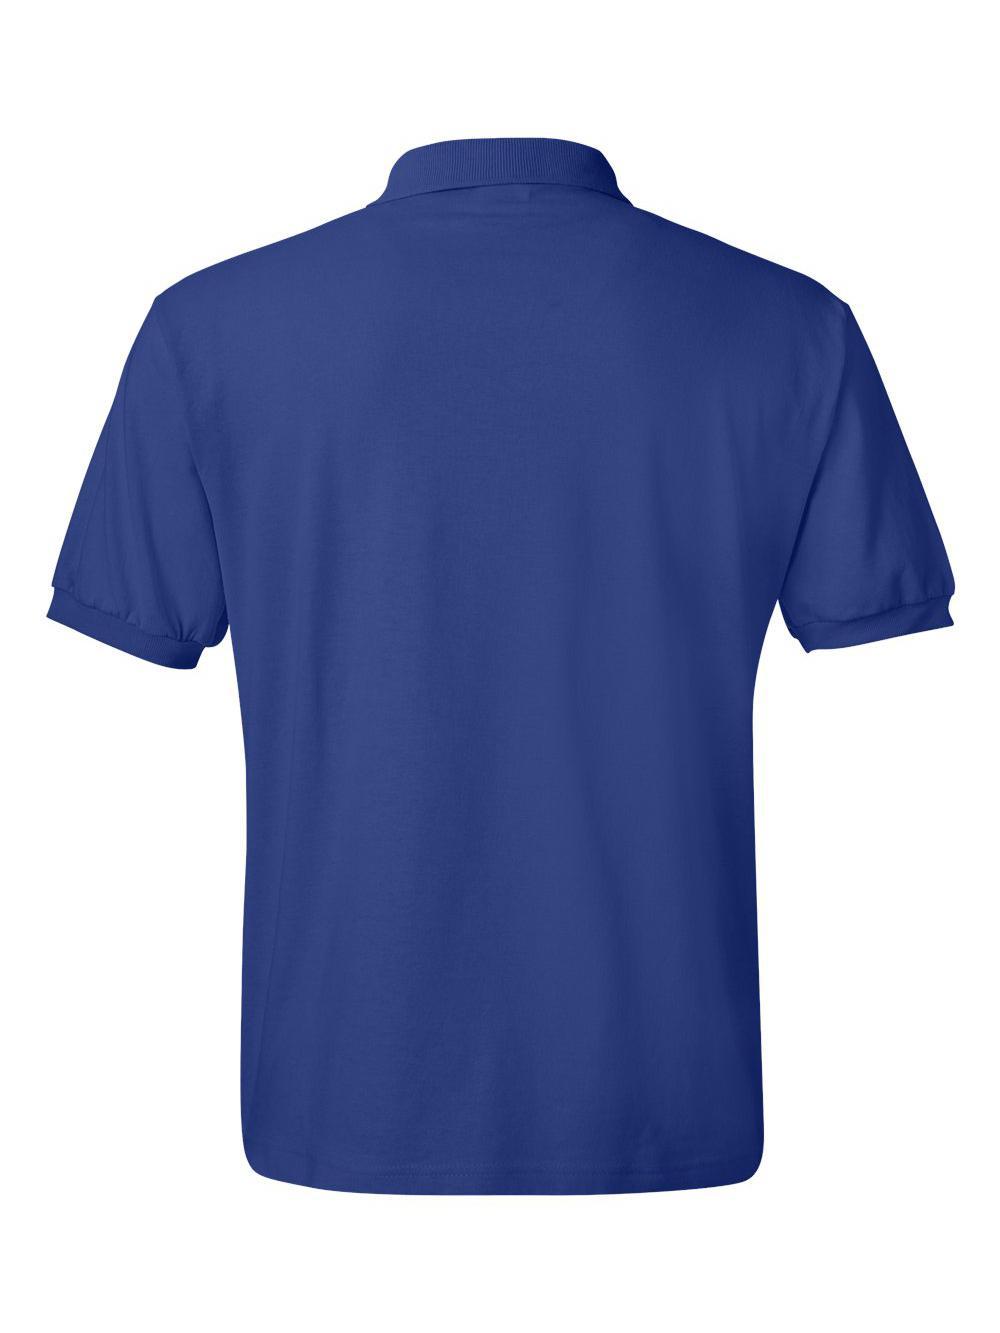 Hanes-Ecosmart-Jersey-Sport-Shirt-054X thumbnail 19